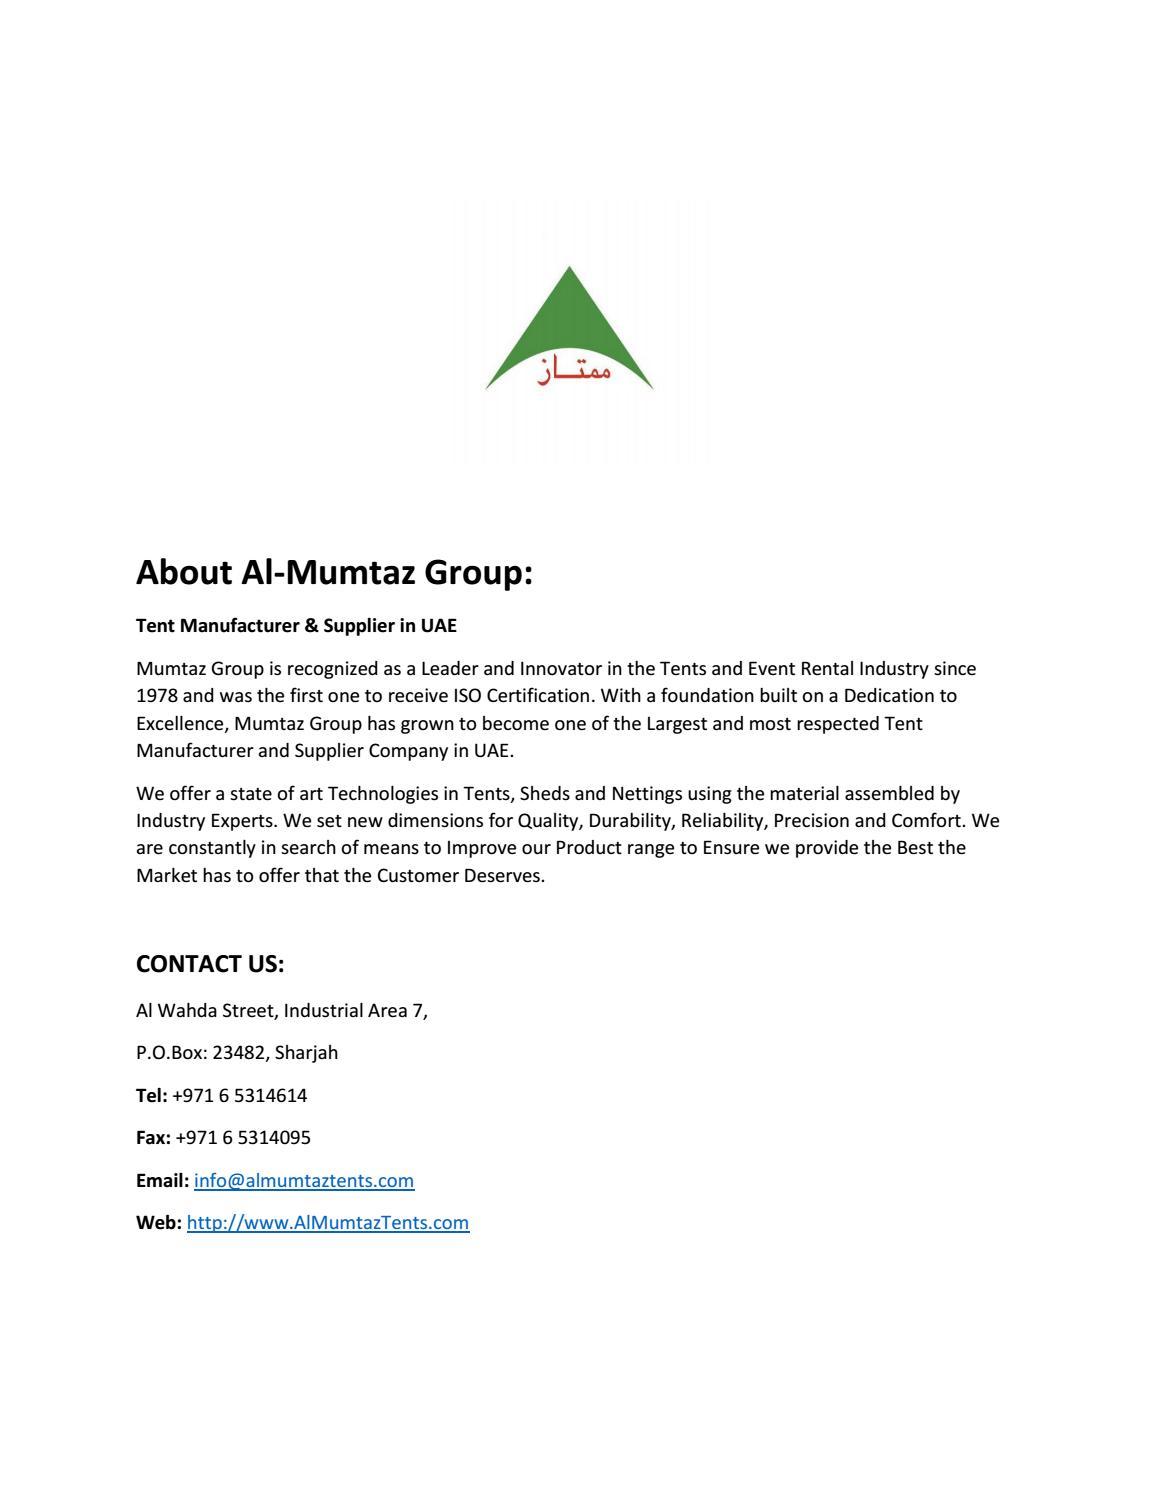 About Al-Mumtaz Group by AlMumtaz Tents - issuu